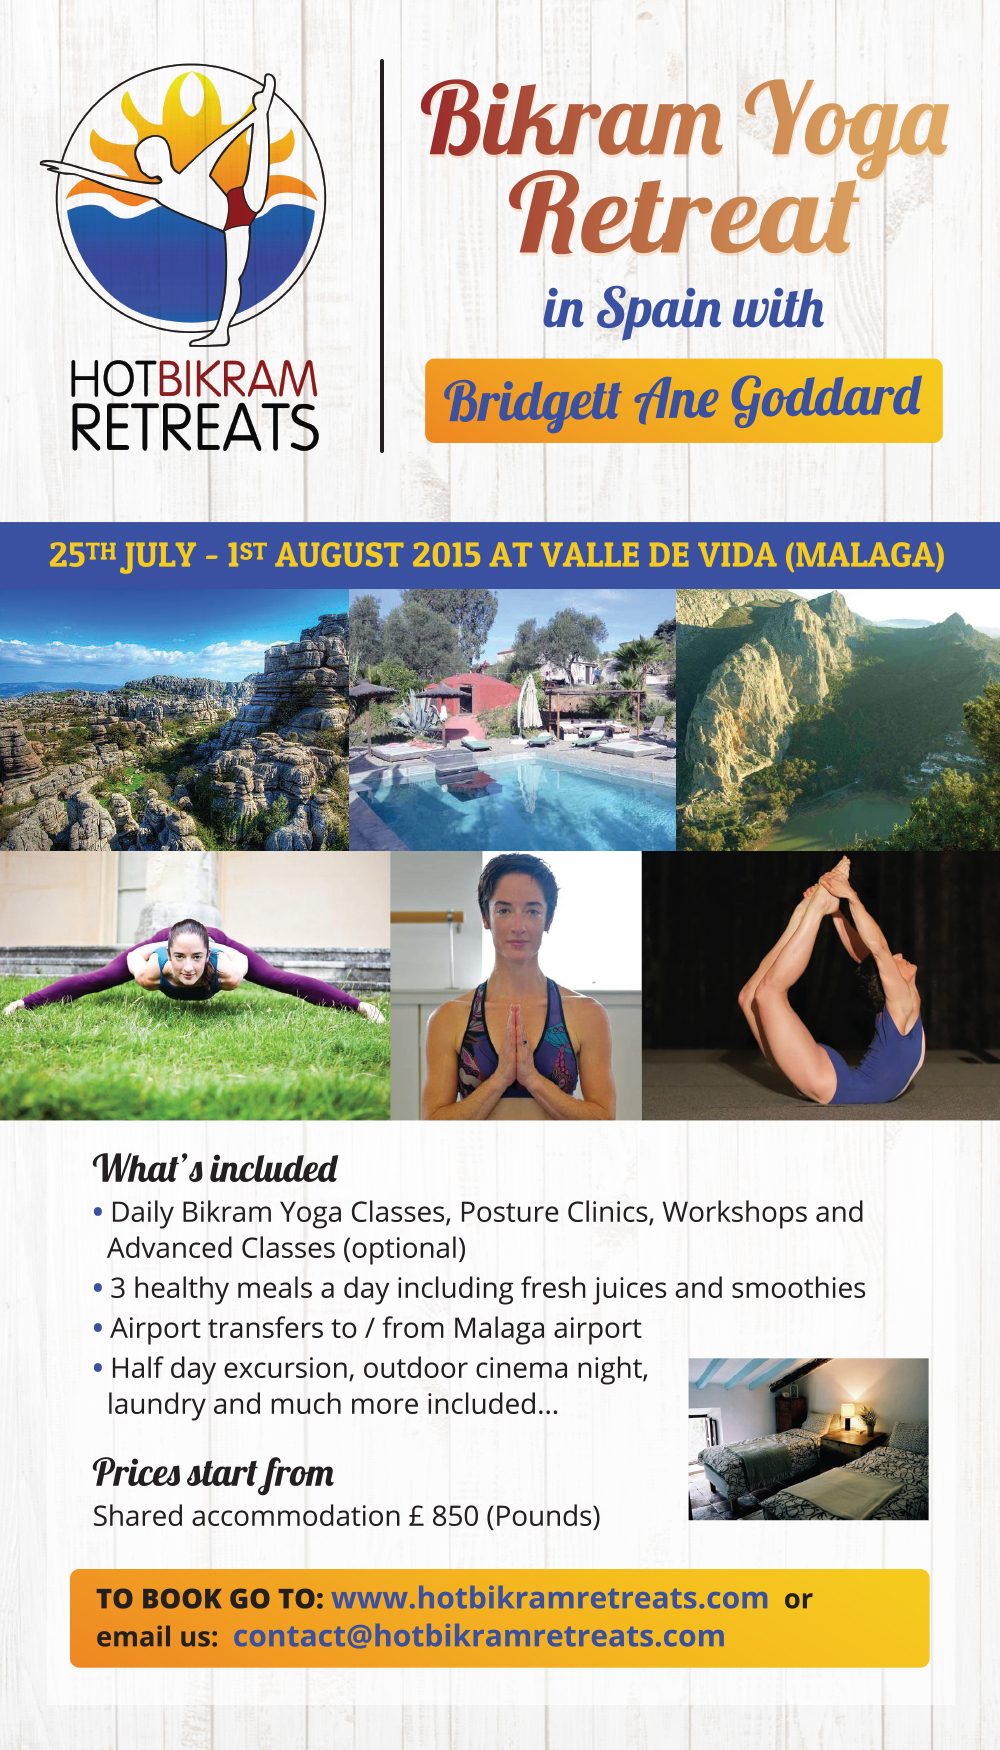 Summer Bikram Yoga Retreat in Spain with Bridgett Ane Goddard